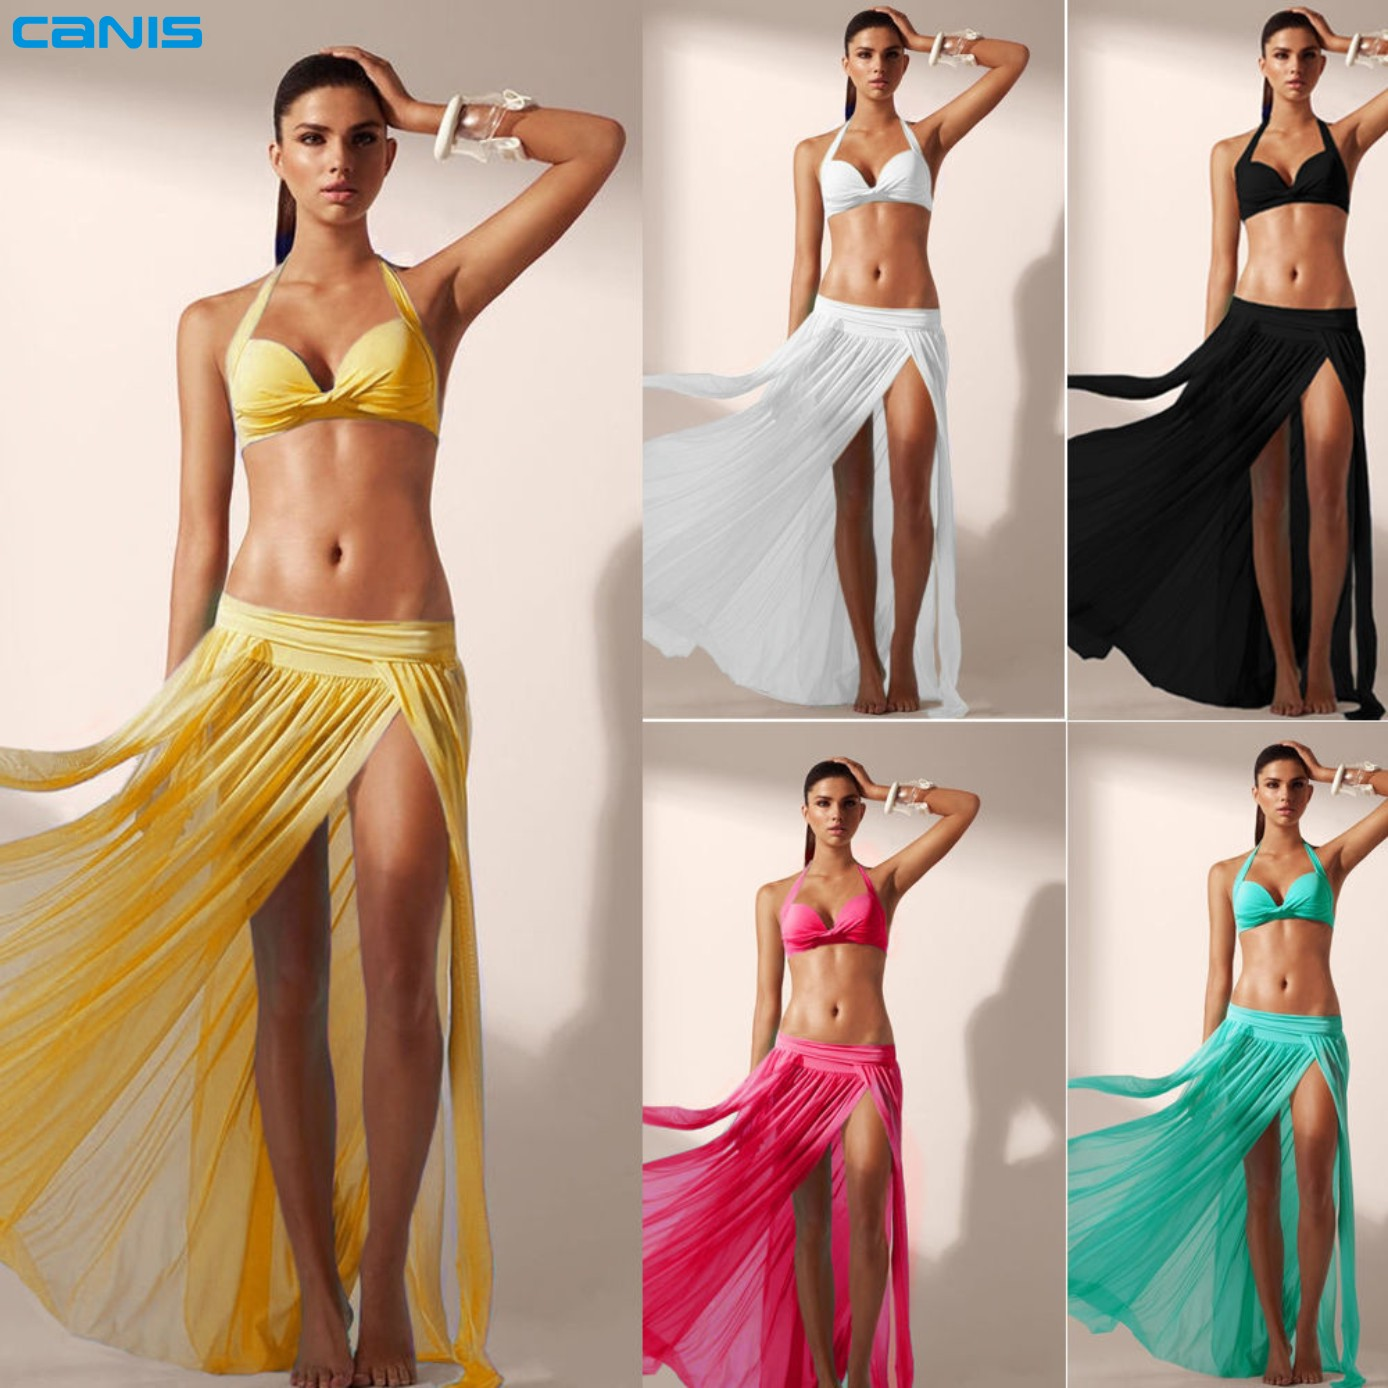 364229101b Detail Feedback Questions about Summer Style 2019 Sexy Women Swimwear  Bikini Beach Cover Up Skirt Beach Swimsuit Cover Up Beachwear 5 Colors Beach  Wear on ...